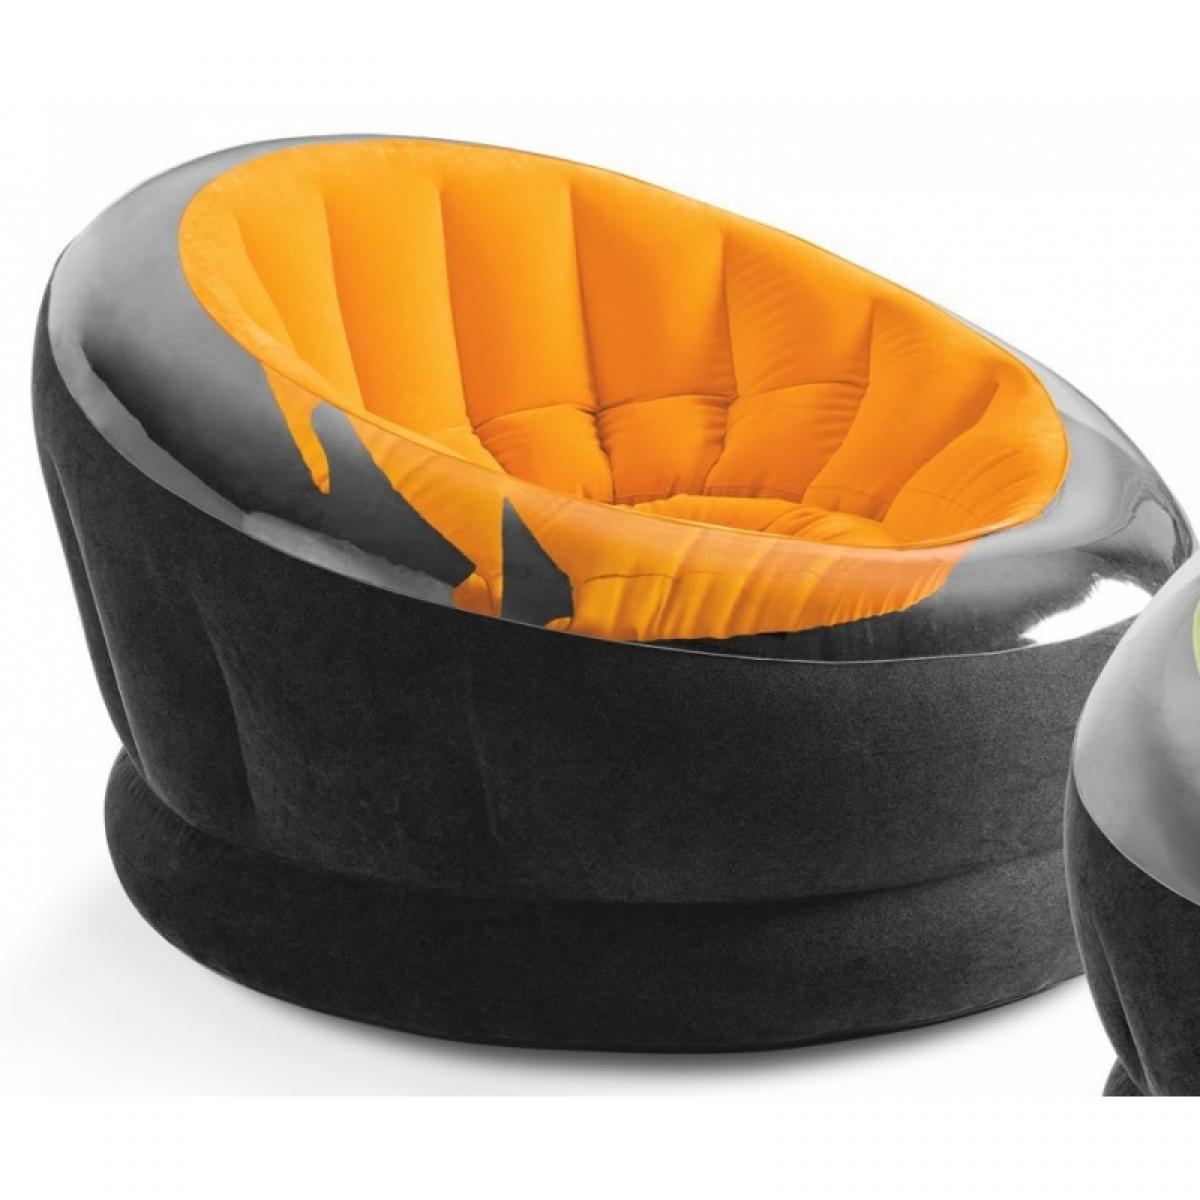 photos canap gonflable intex. Black Bedroom Furniture Sets. Home Design Ideas